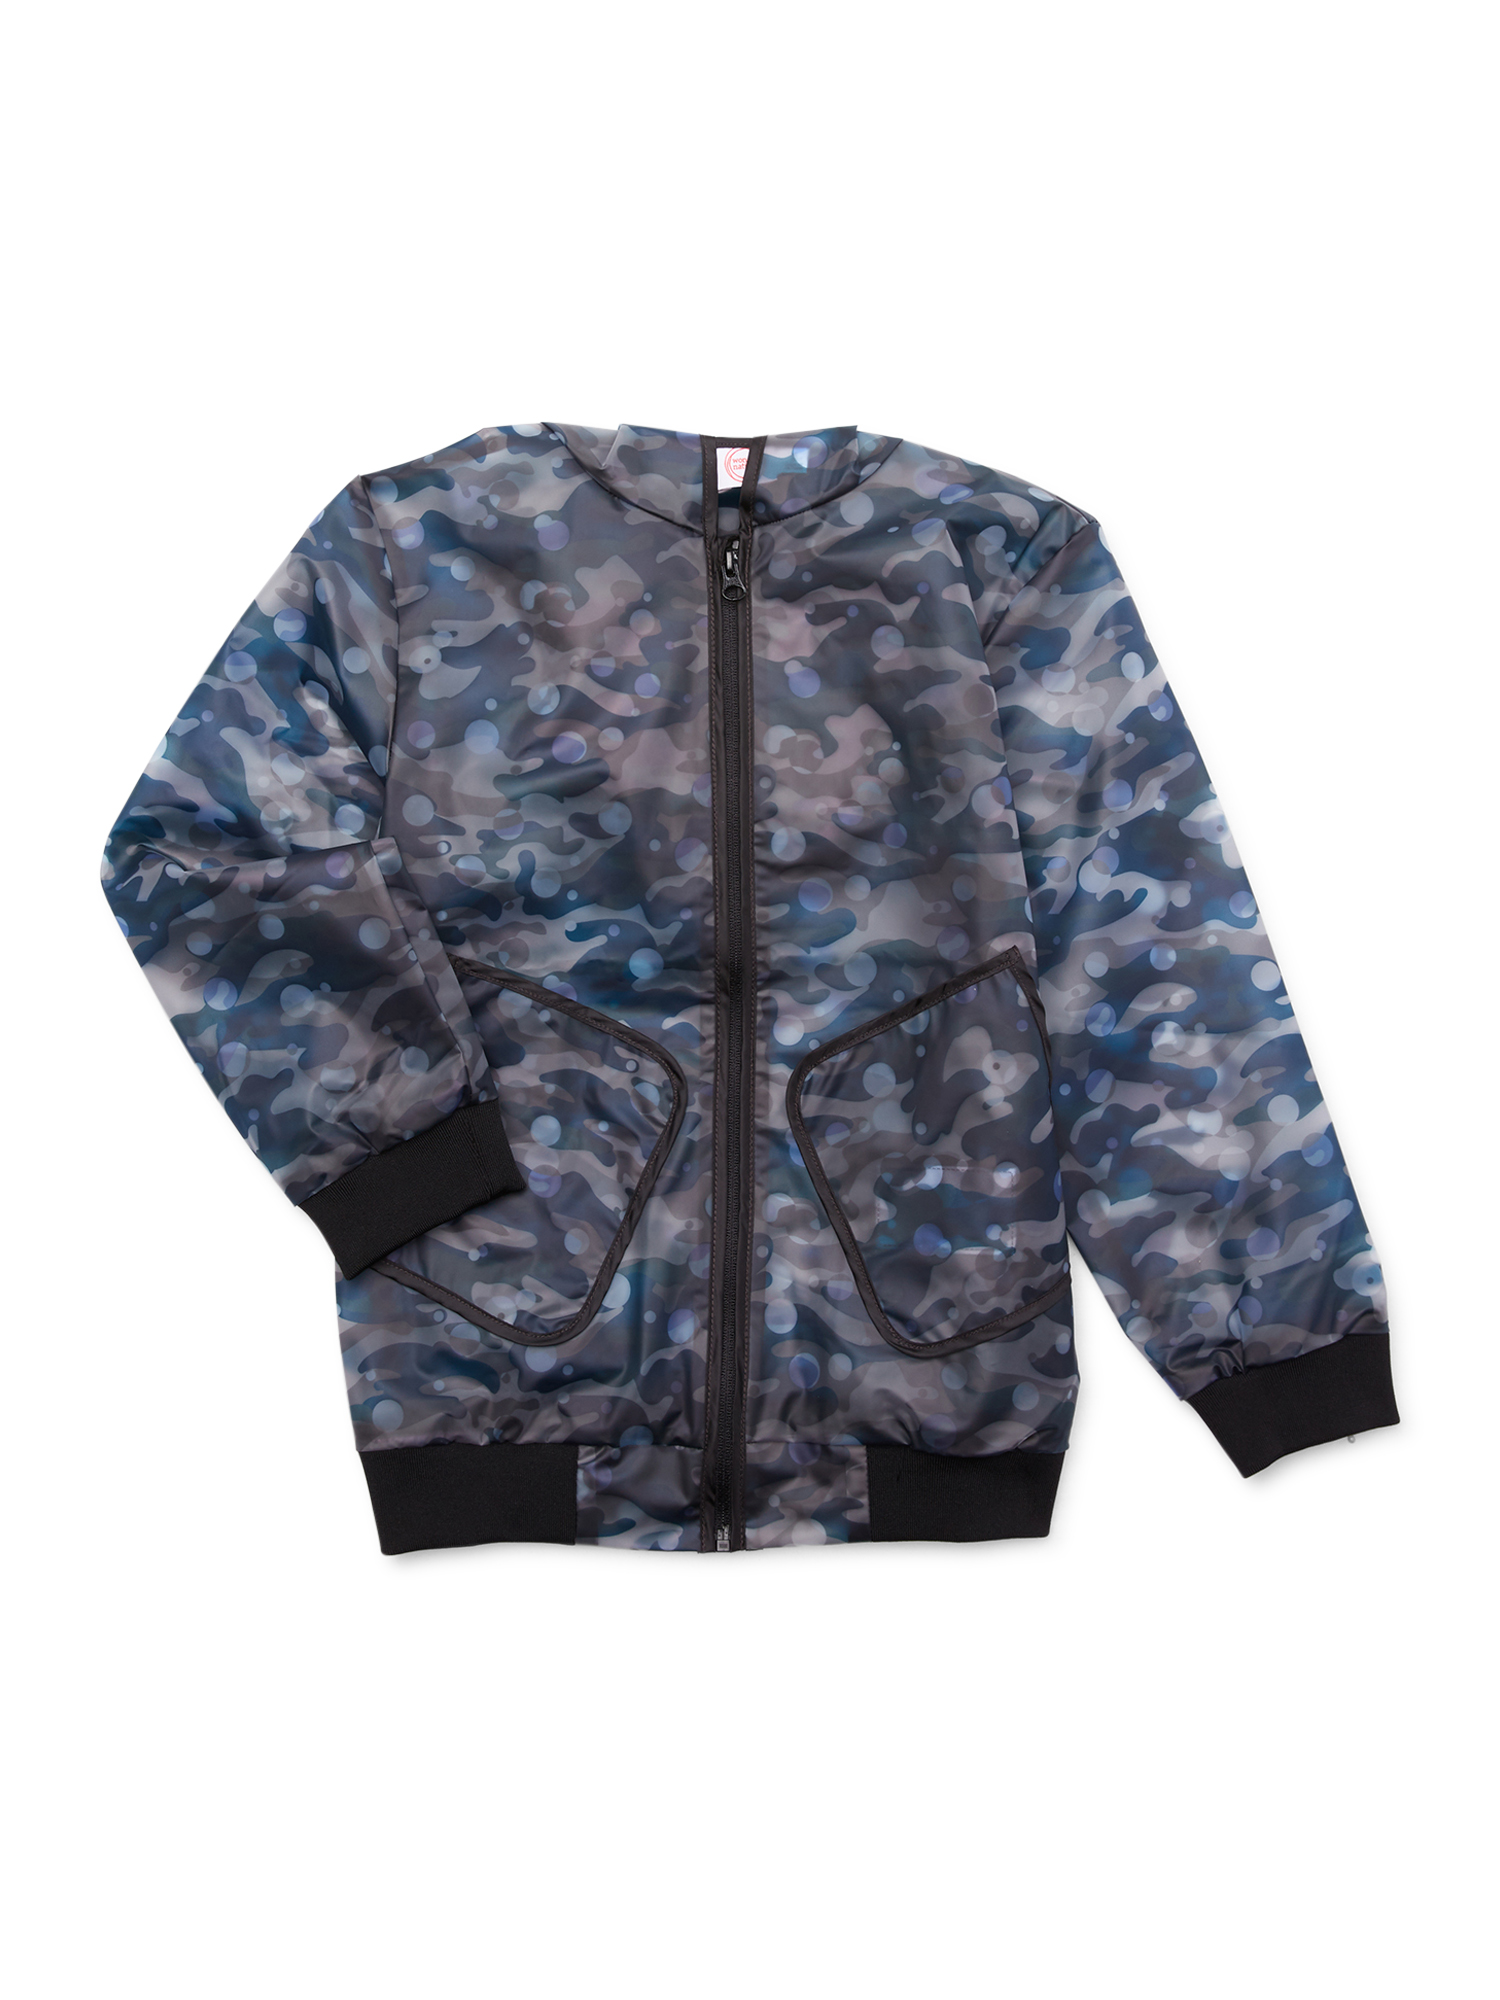 7-8 Boys Ripstop Junior Boys Python Jacket in Black